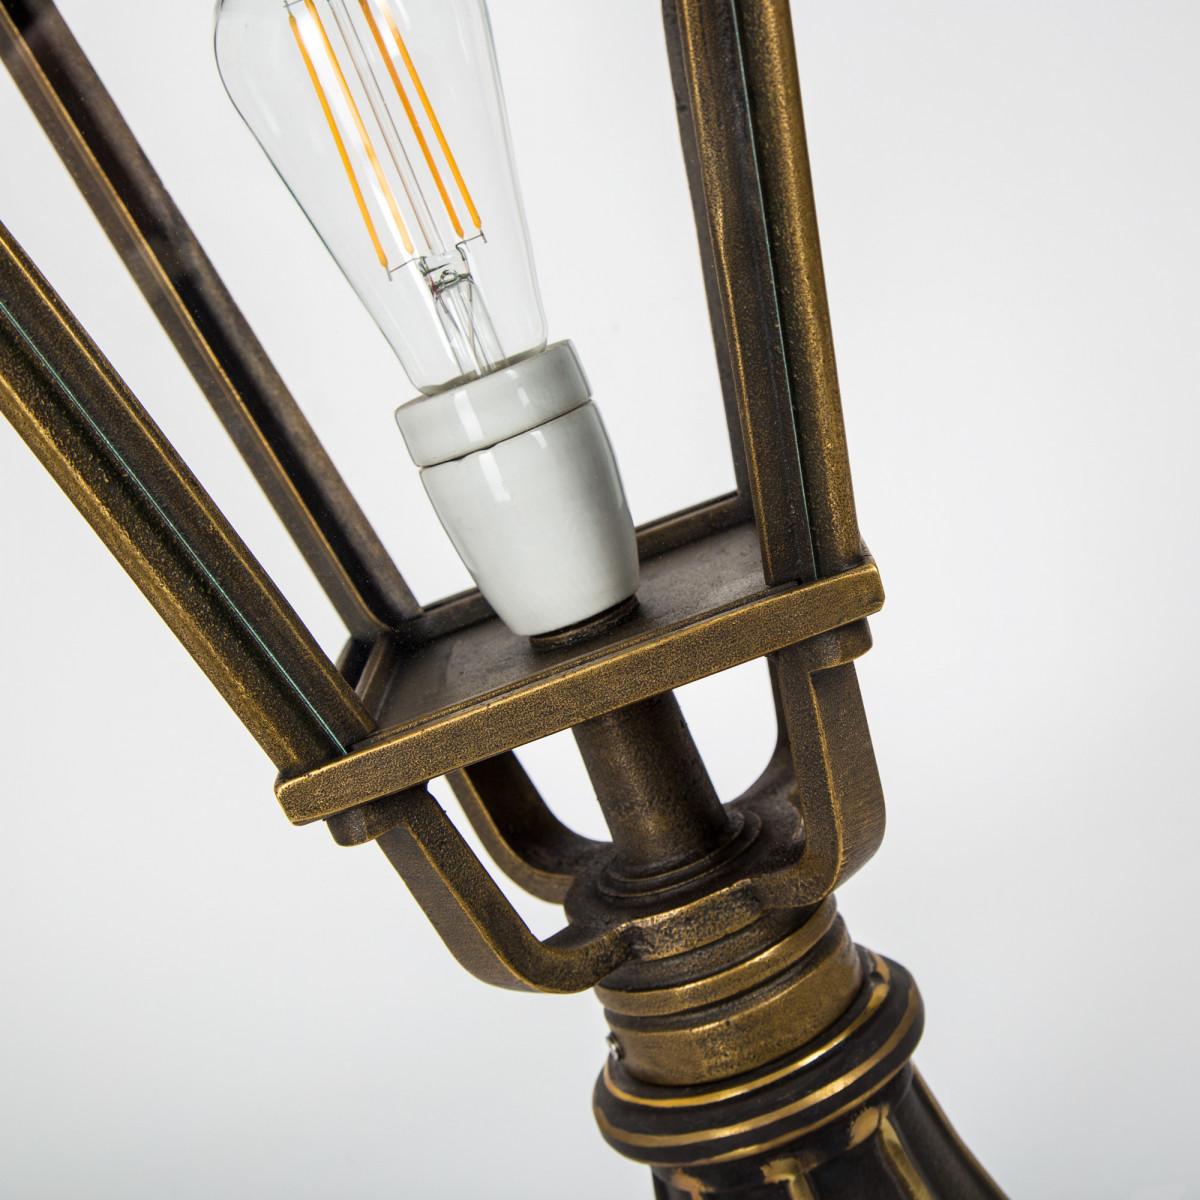 Tuinlamp Rijswijk sokkel M